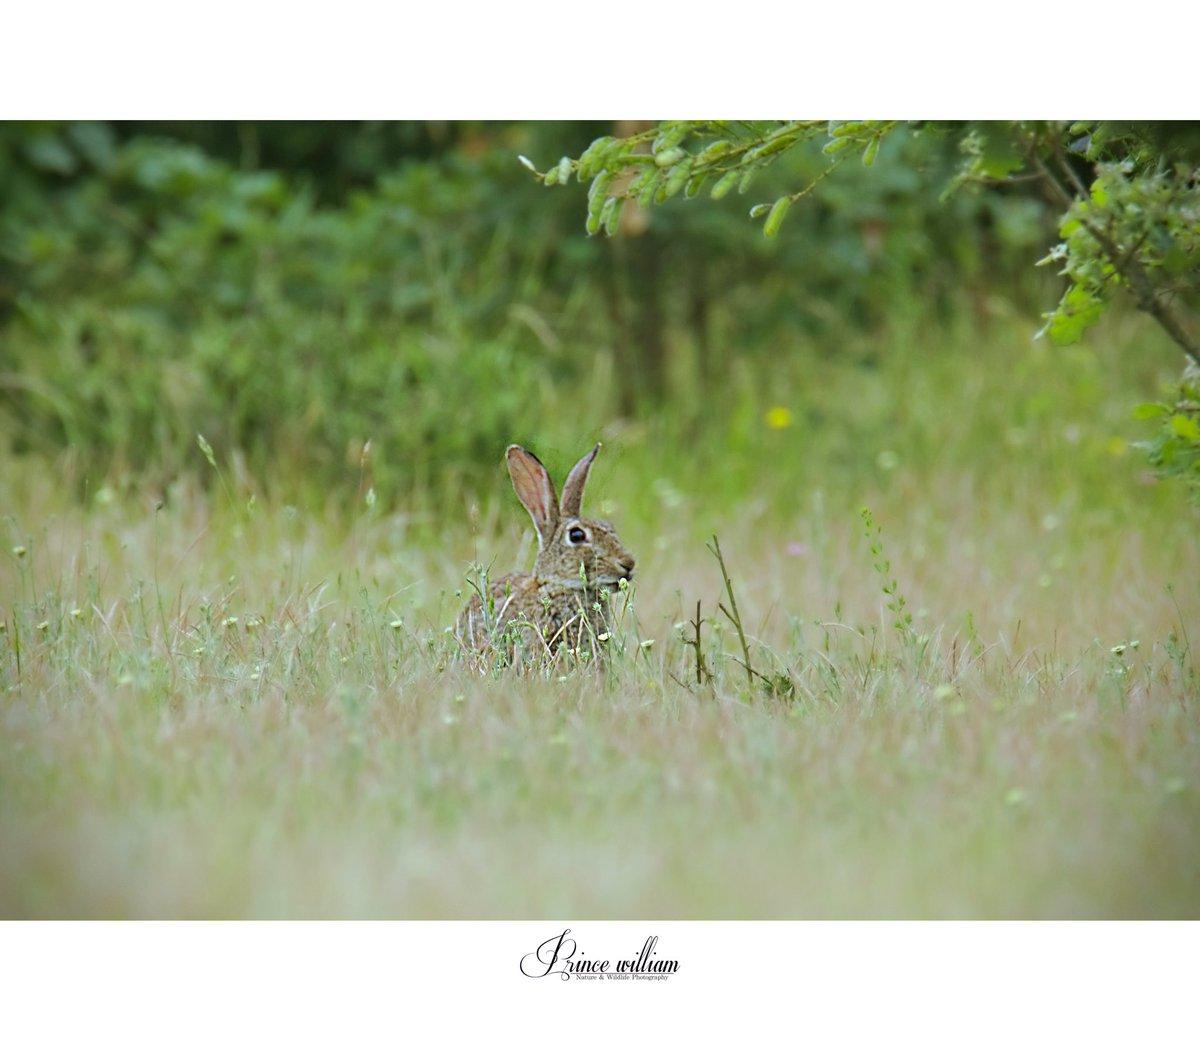 #naturephotos #wildlifephotography #wildnature #photoshoot #safari #france #photography #siberiantiger #animallover #animal #savetigers #respect#saveanimals #helpanimals #loveanimal #photography#peacocks#encounter #photographylovers#deer#cheetah#netgeo #netgeowild #myworld #deer https://t.co/rvLCszcaok